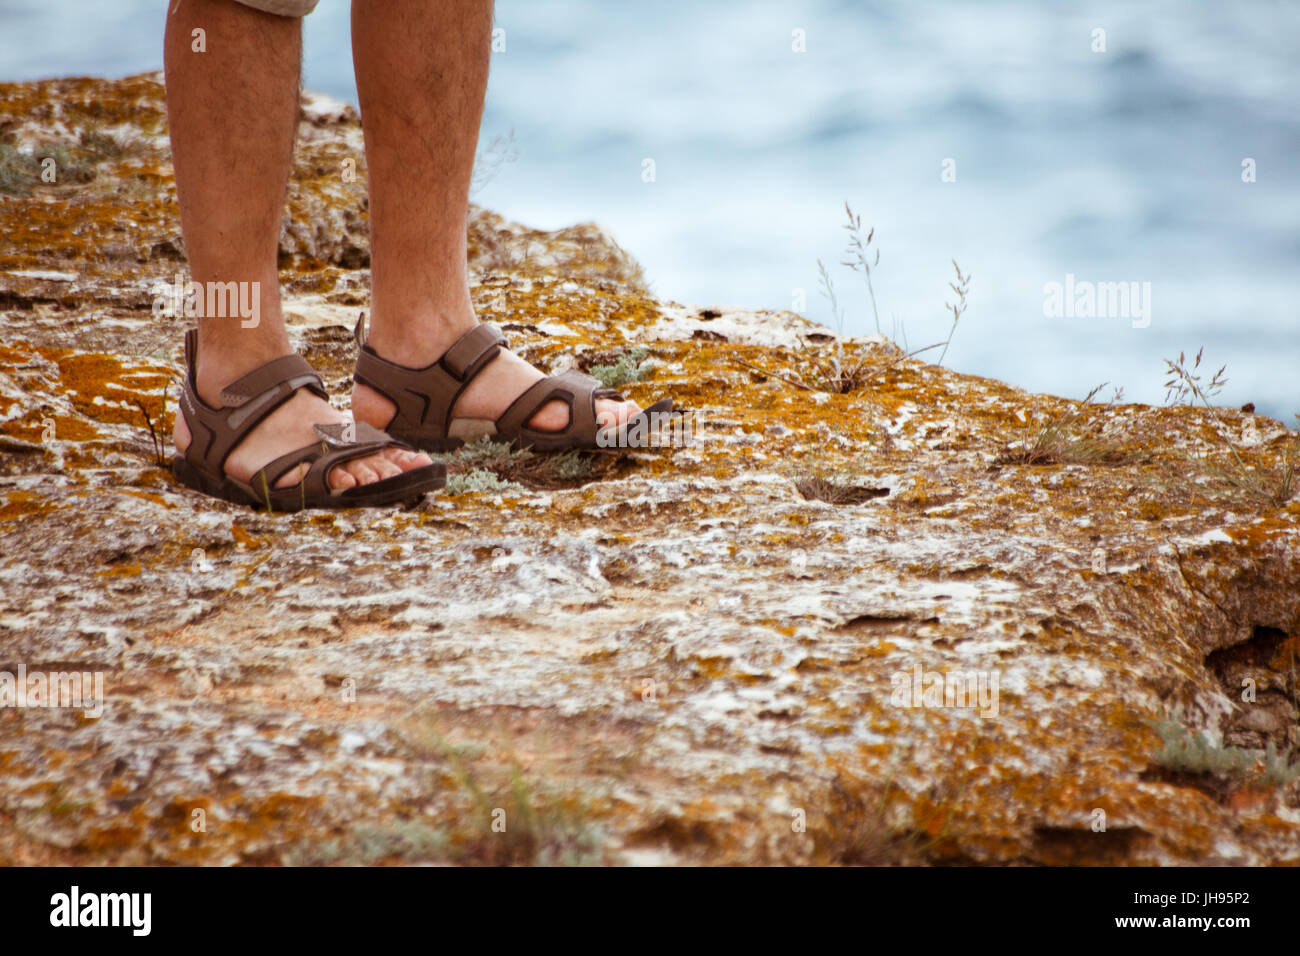 8564d6f7eac Sandals Man Woman Stock Photos   Sandals Man Woman Stock Images - Alamy